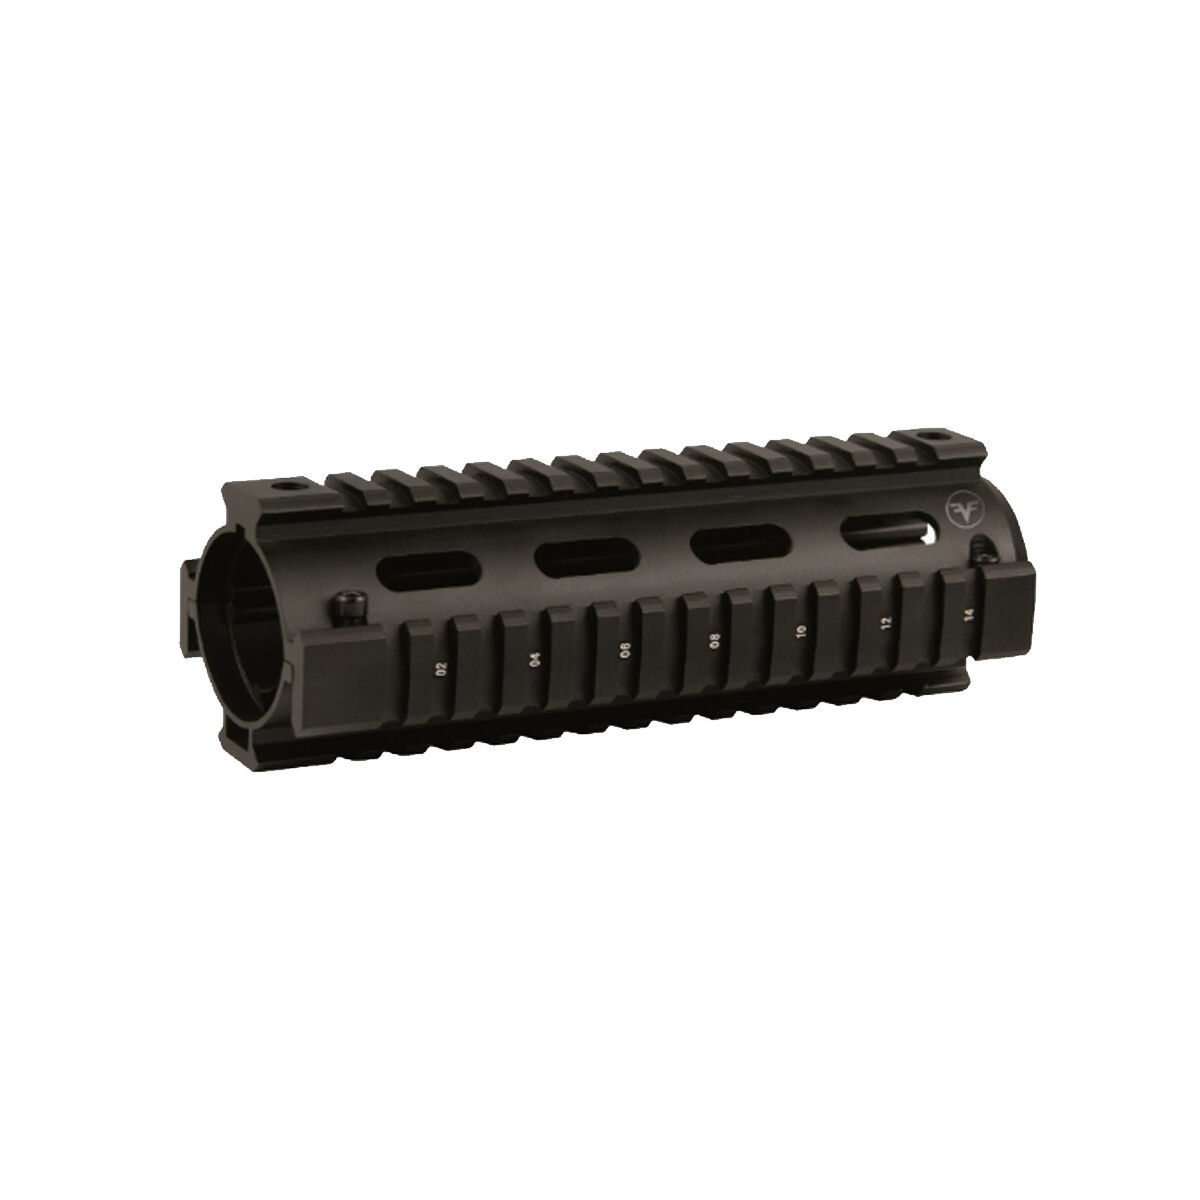 6.7 inch Carbine Length Two Piece Drop In Quad Rail Handguard Fit Round Cap 223